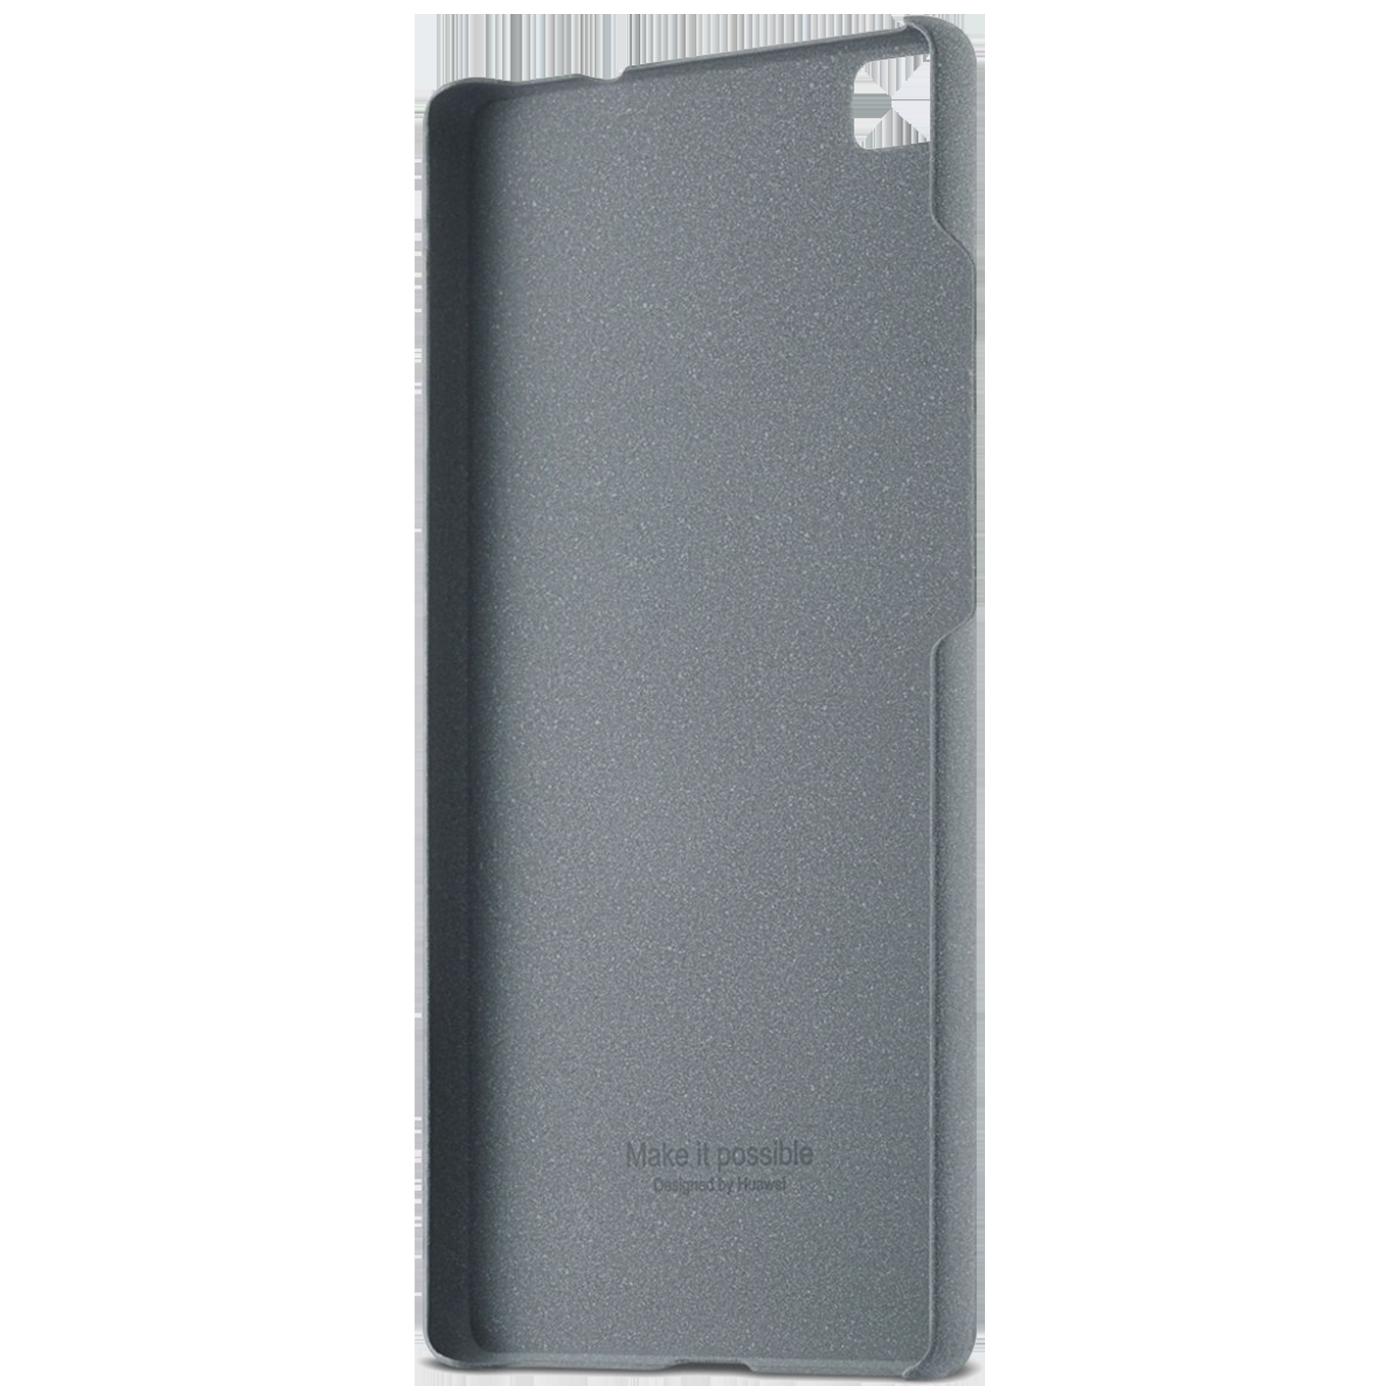 Navlaka za mobitel Huawei P8 Lite